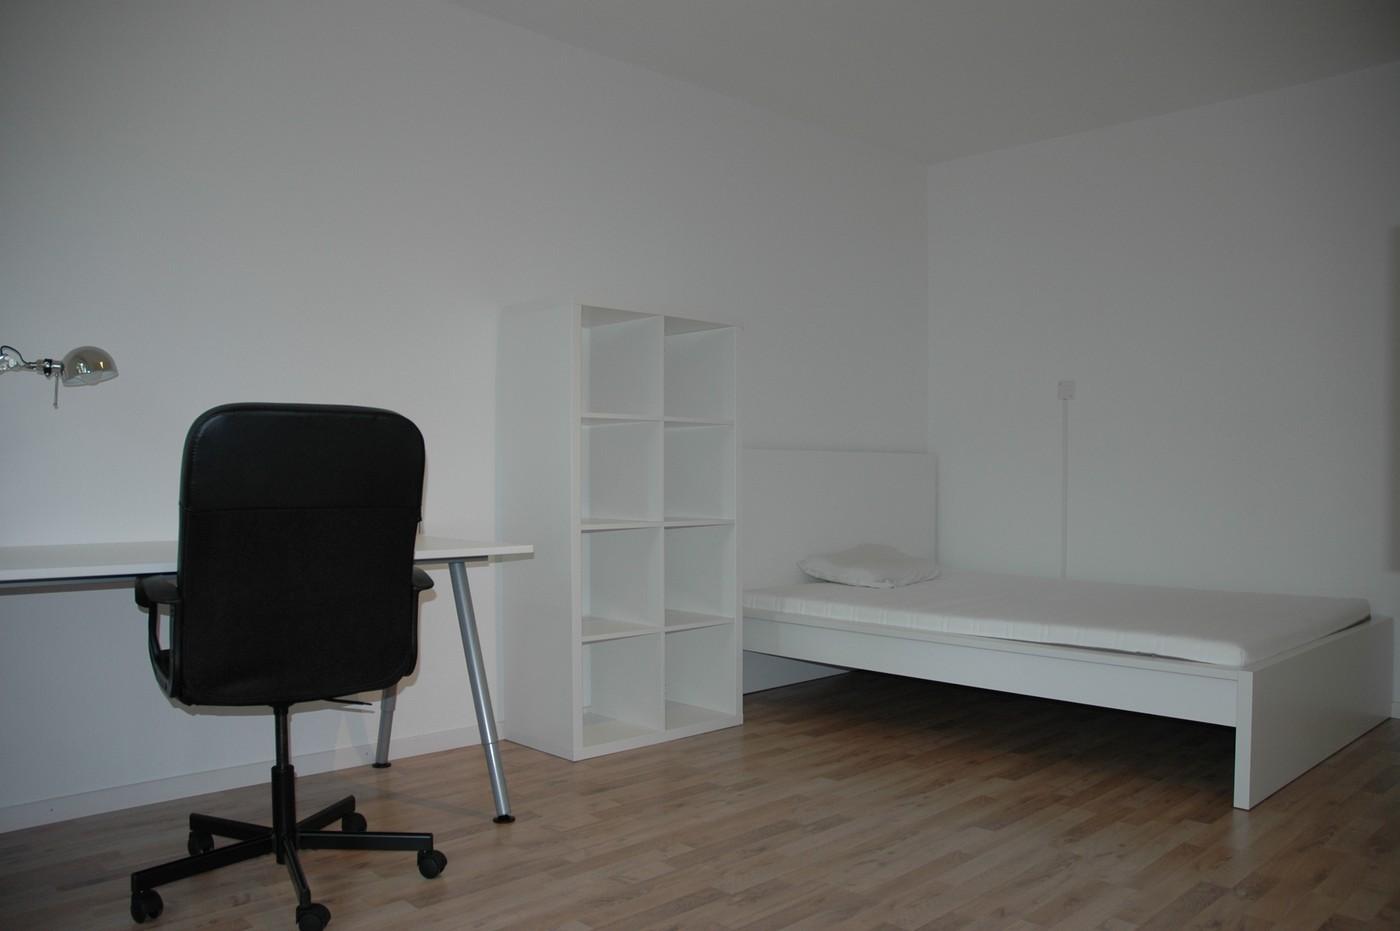 WG Zimmer in Zürich mieten | flatfox